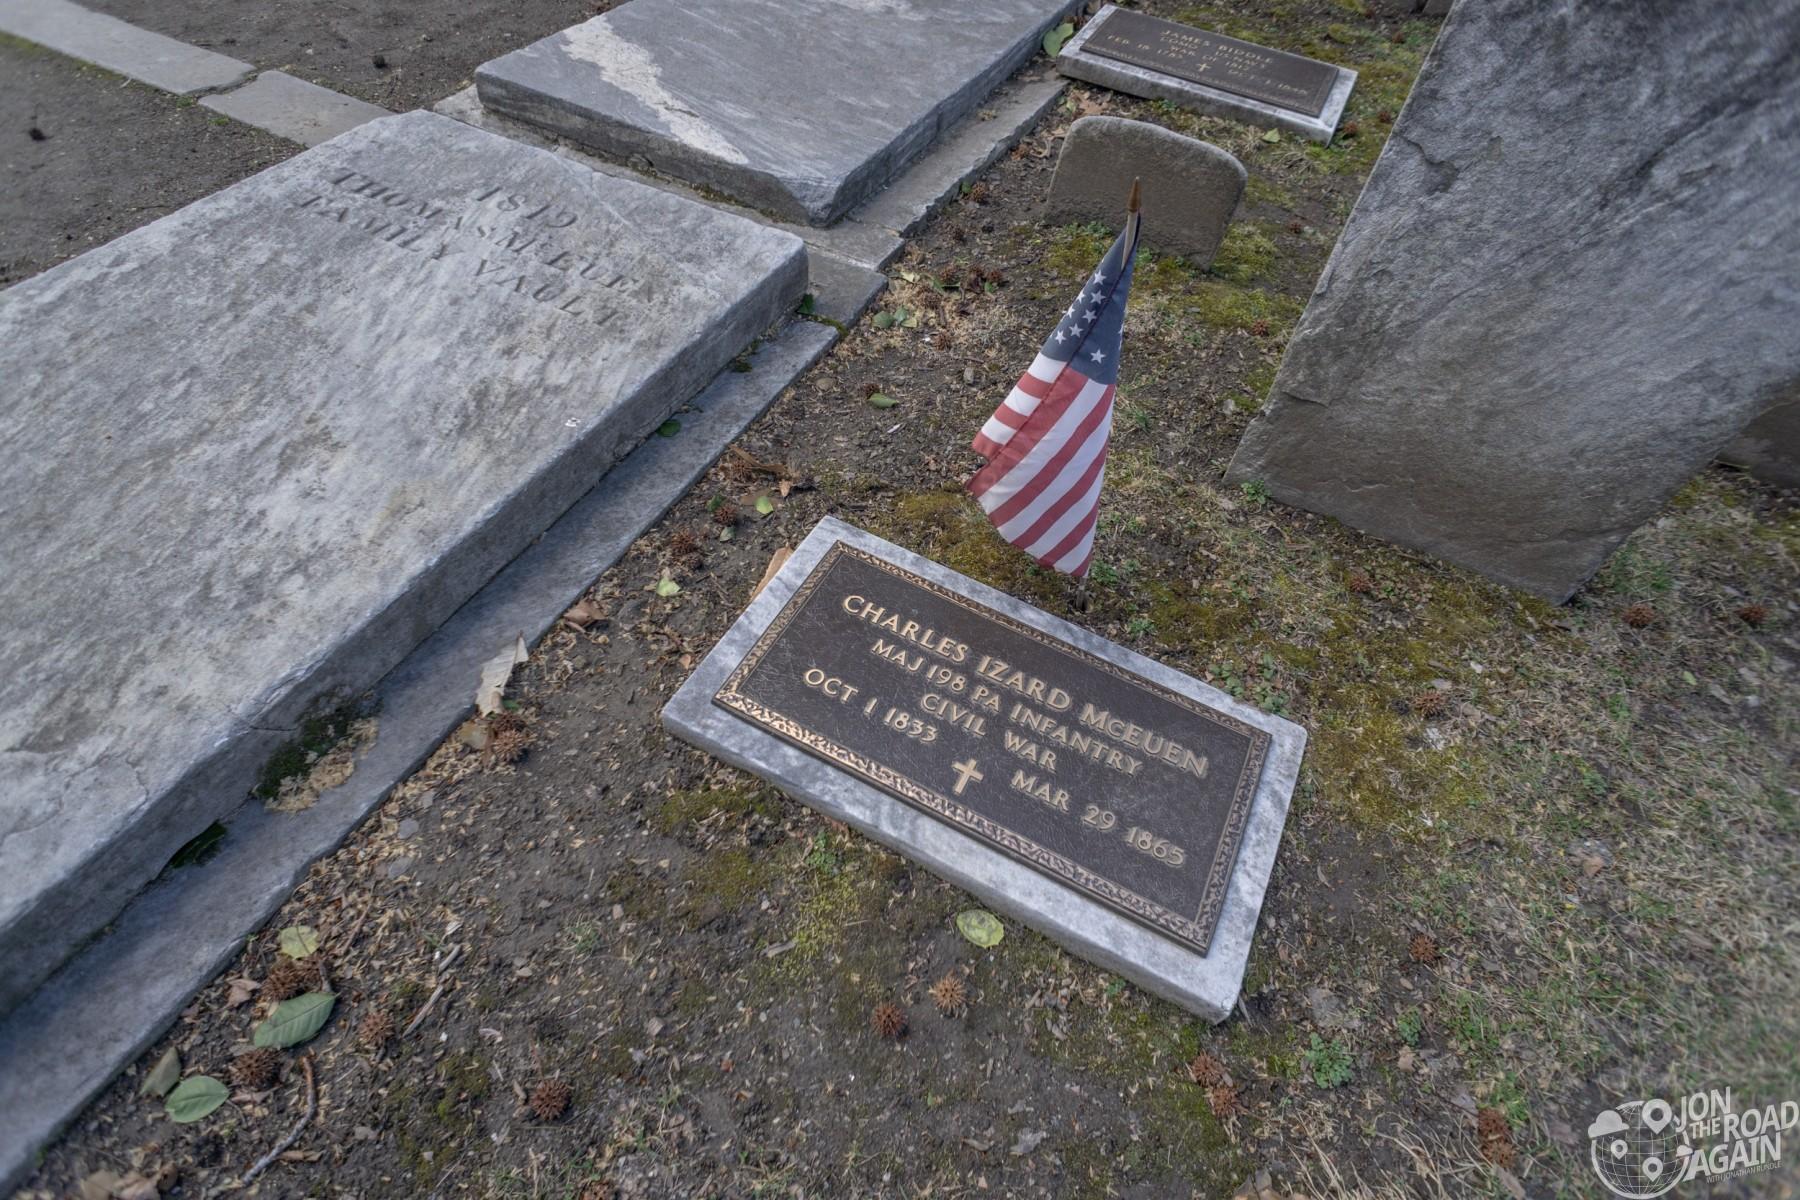 Charles McEuen Grave